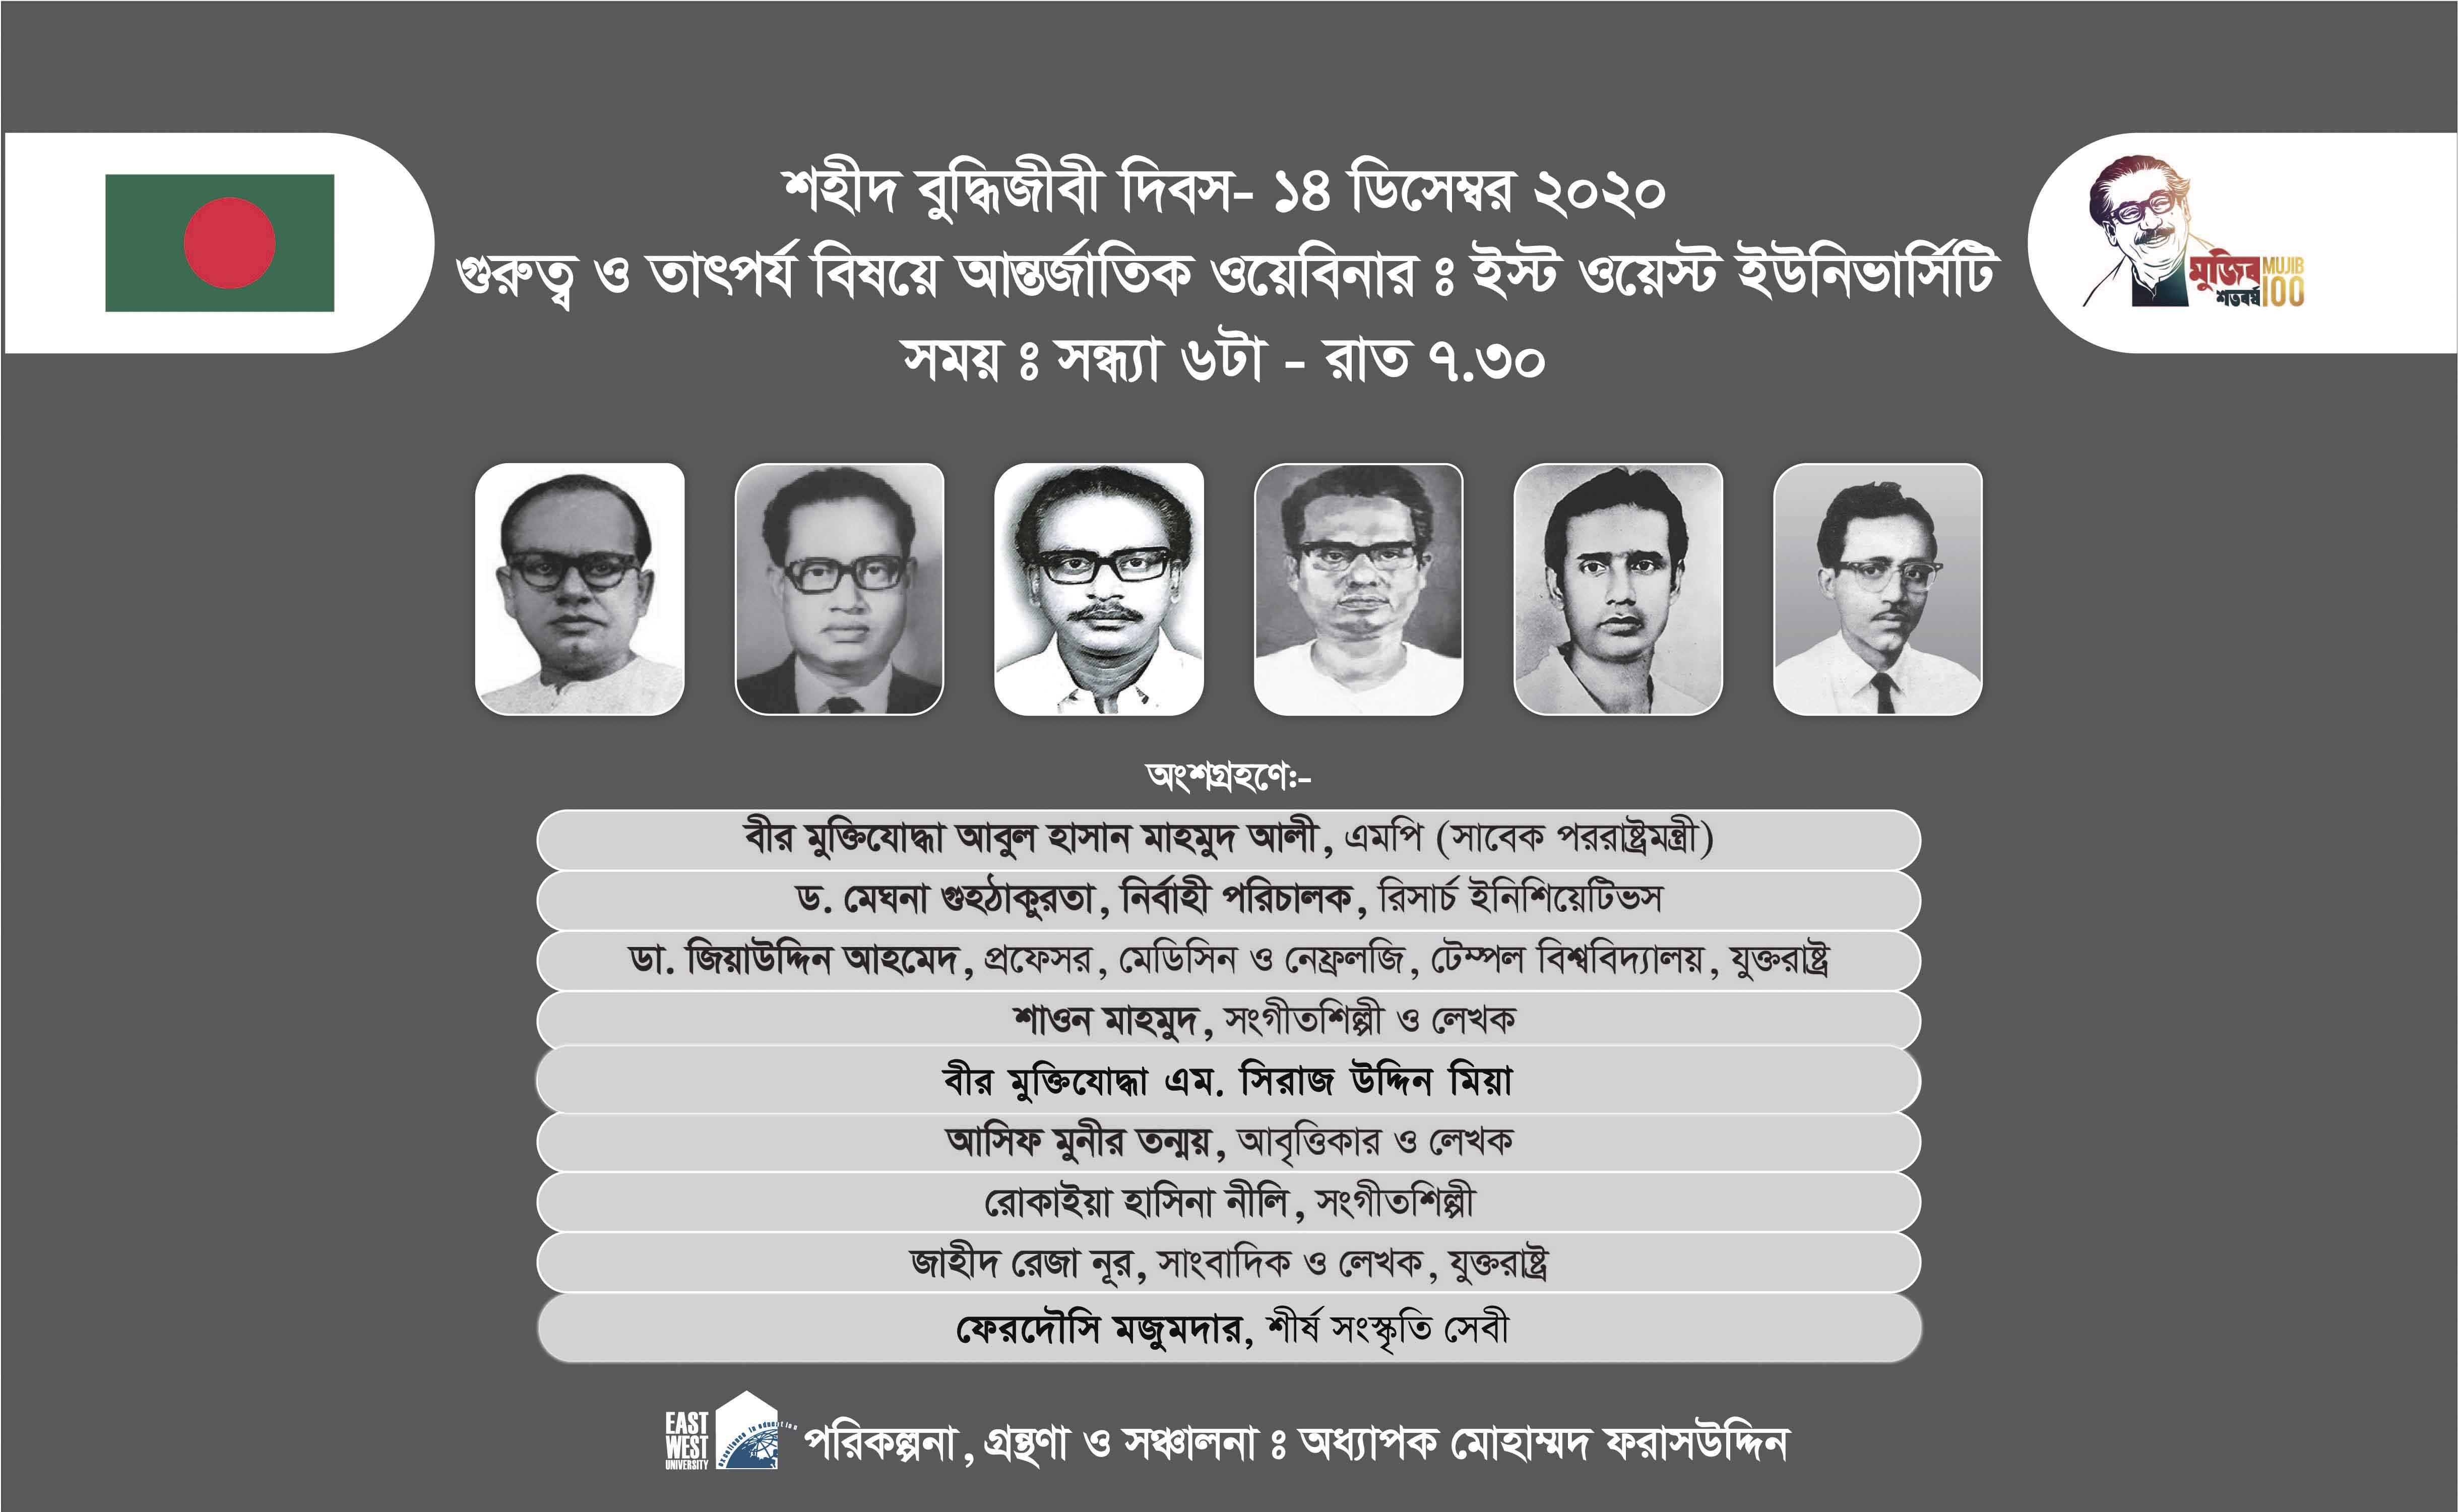 EWU Webinar Urge to build the Nation as the Martyr...